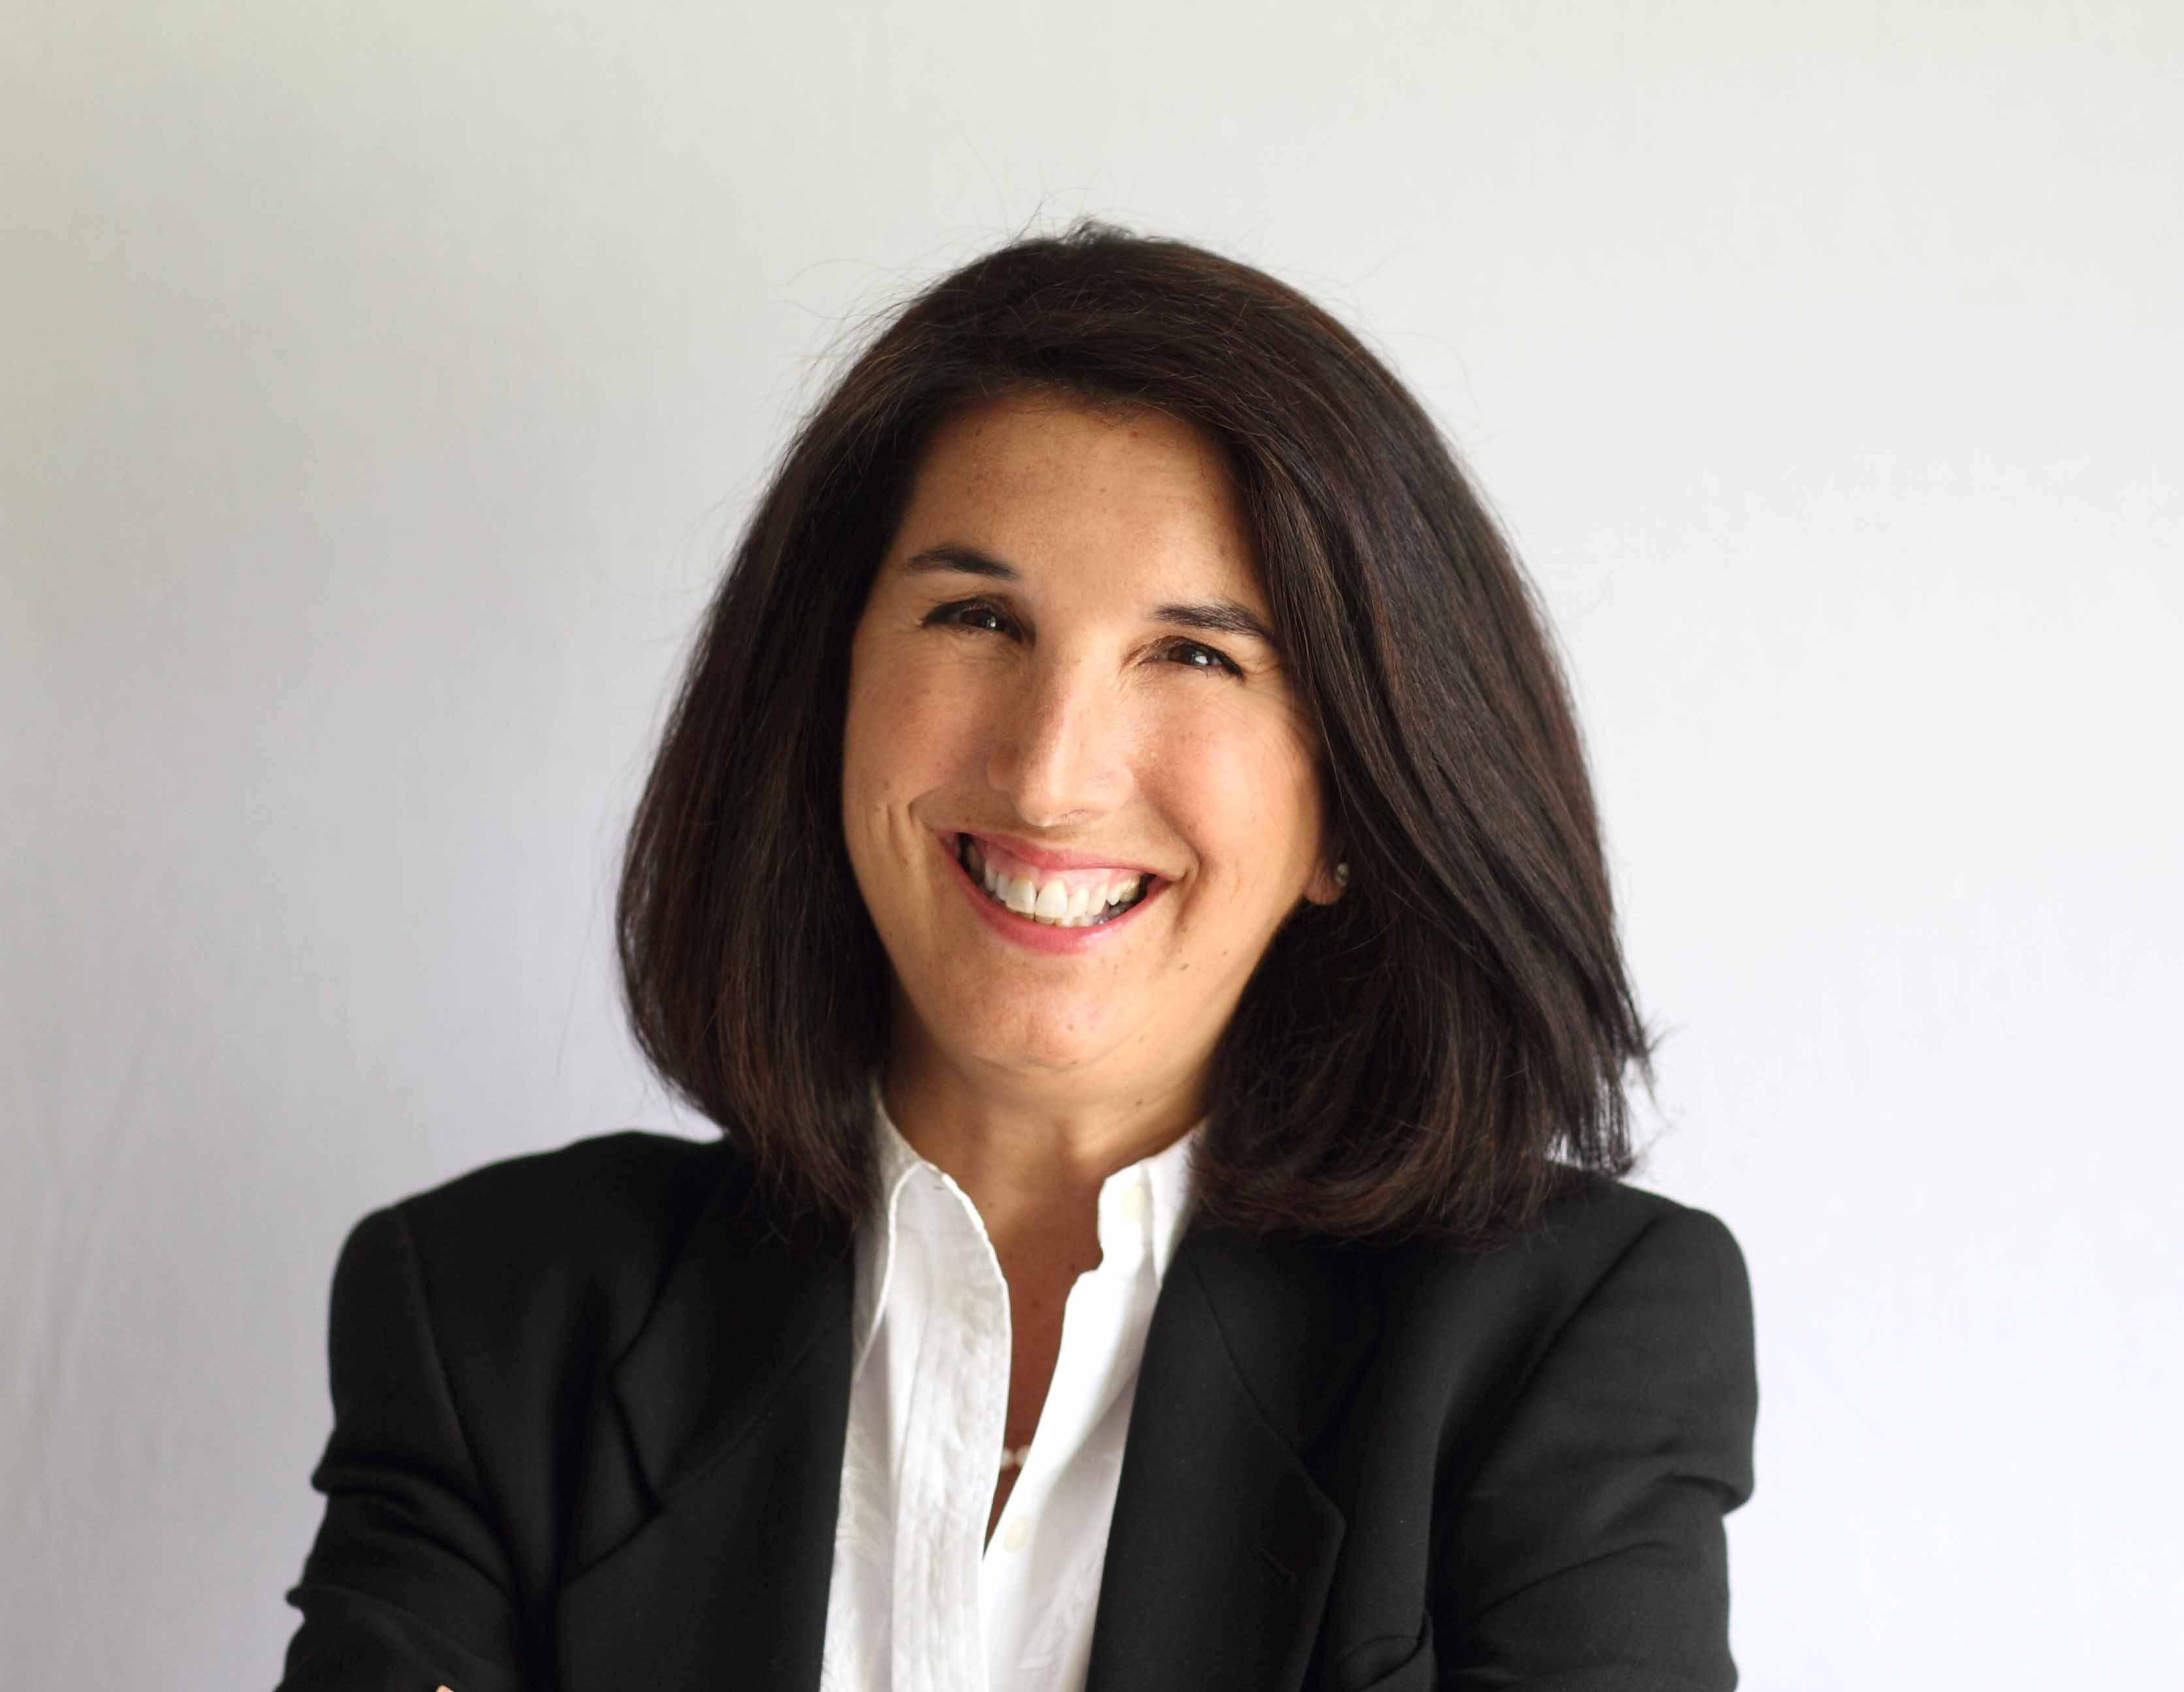 Laura Meier profile image